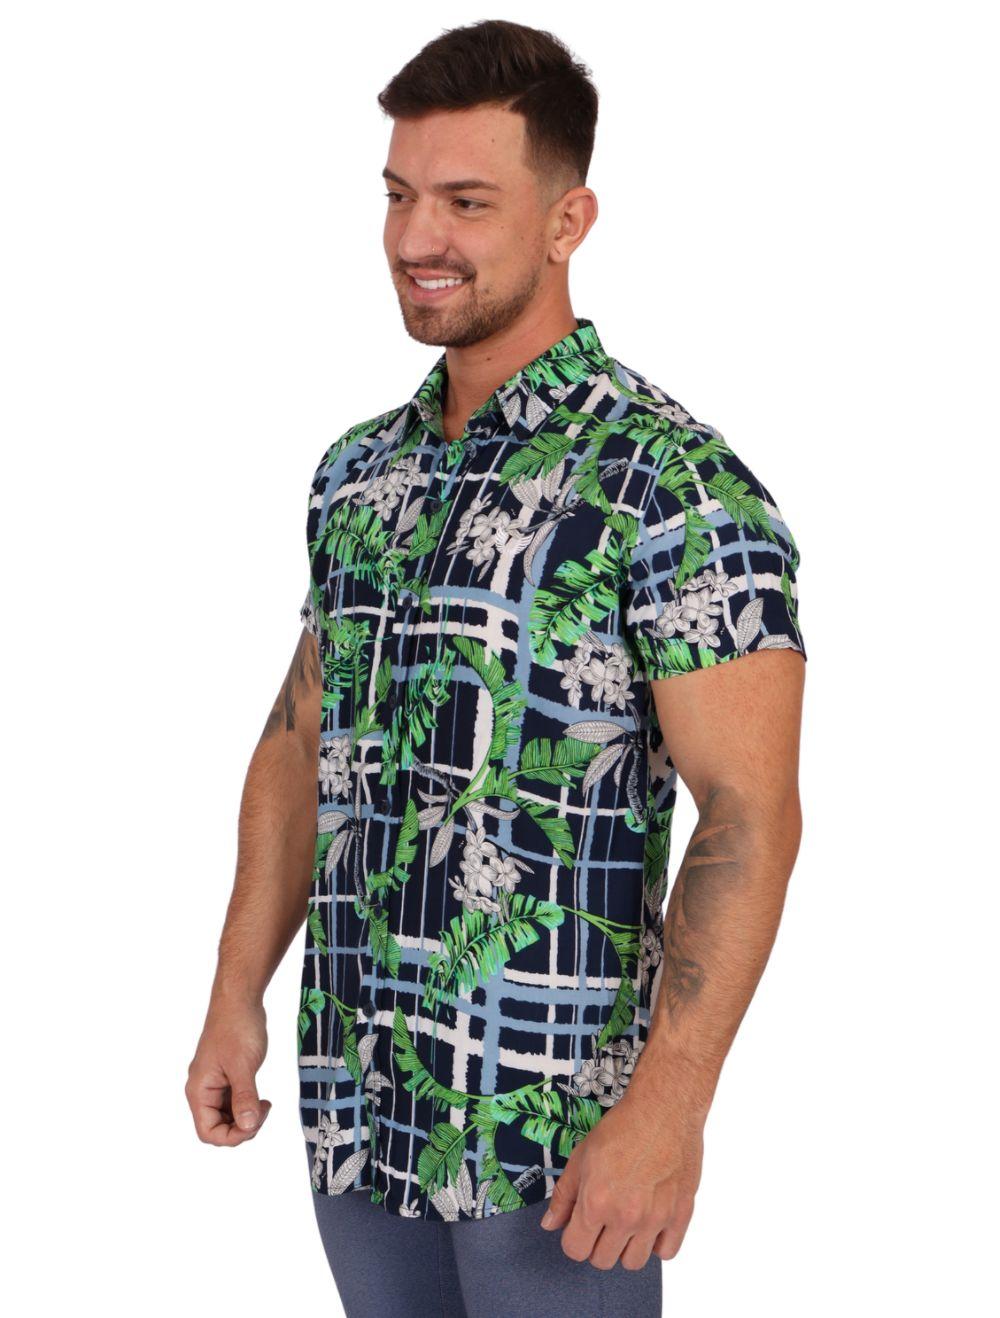 Camisa Masculina Manga Curta Slim Azul com Floral Verde